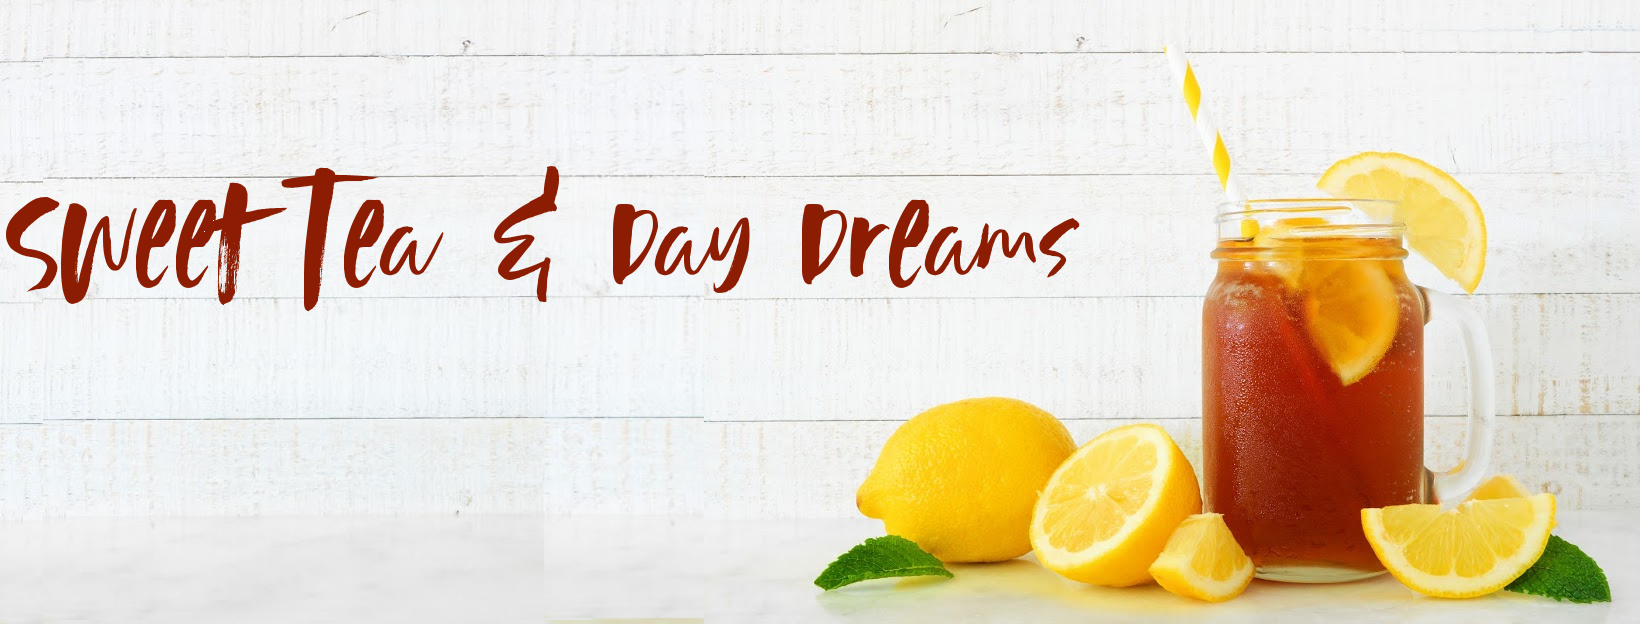 Sweet Tea & Day Dreams